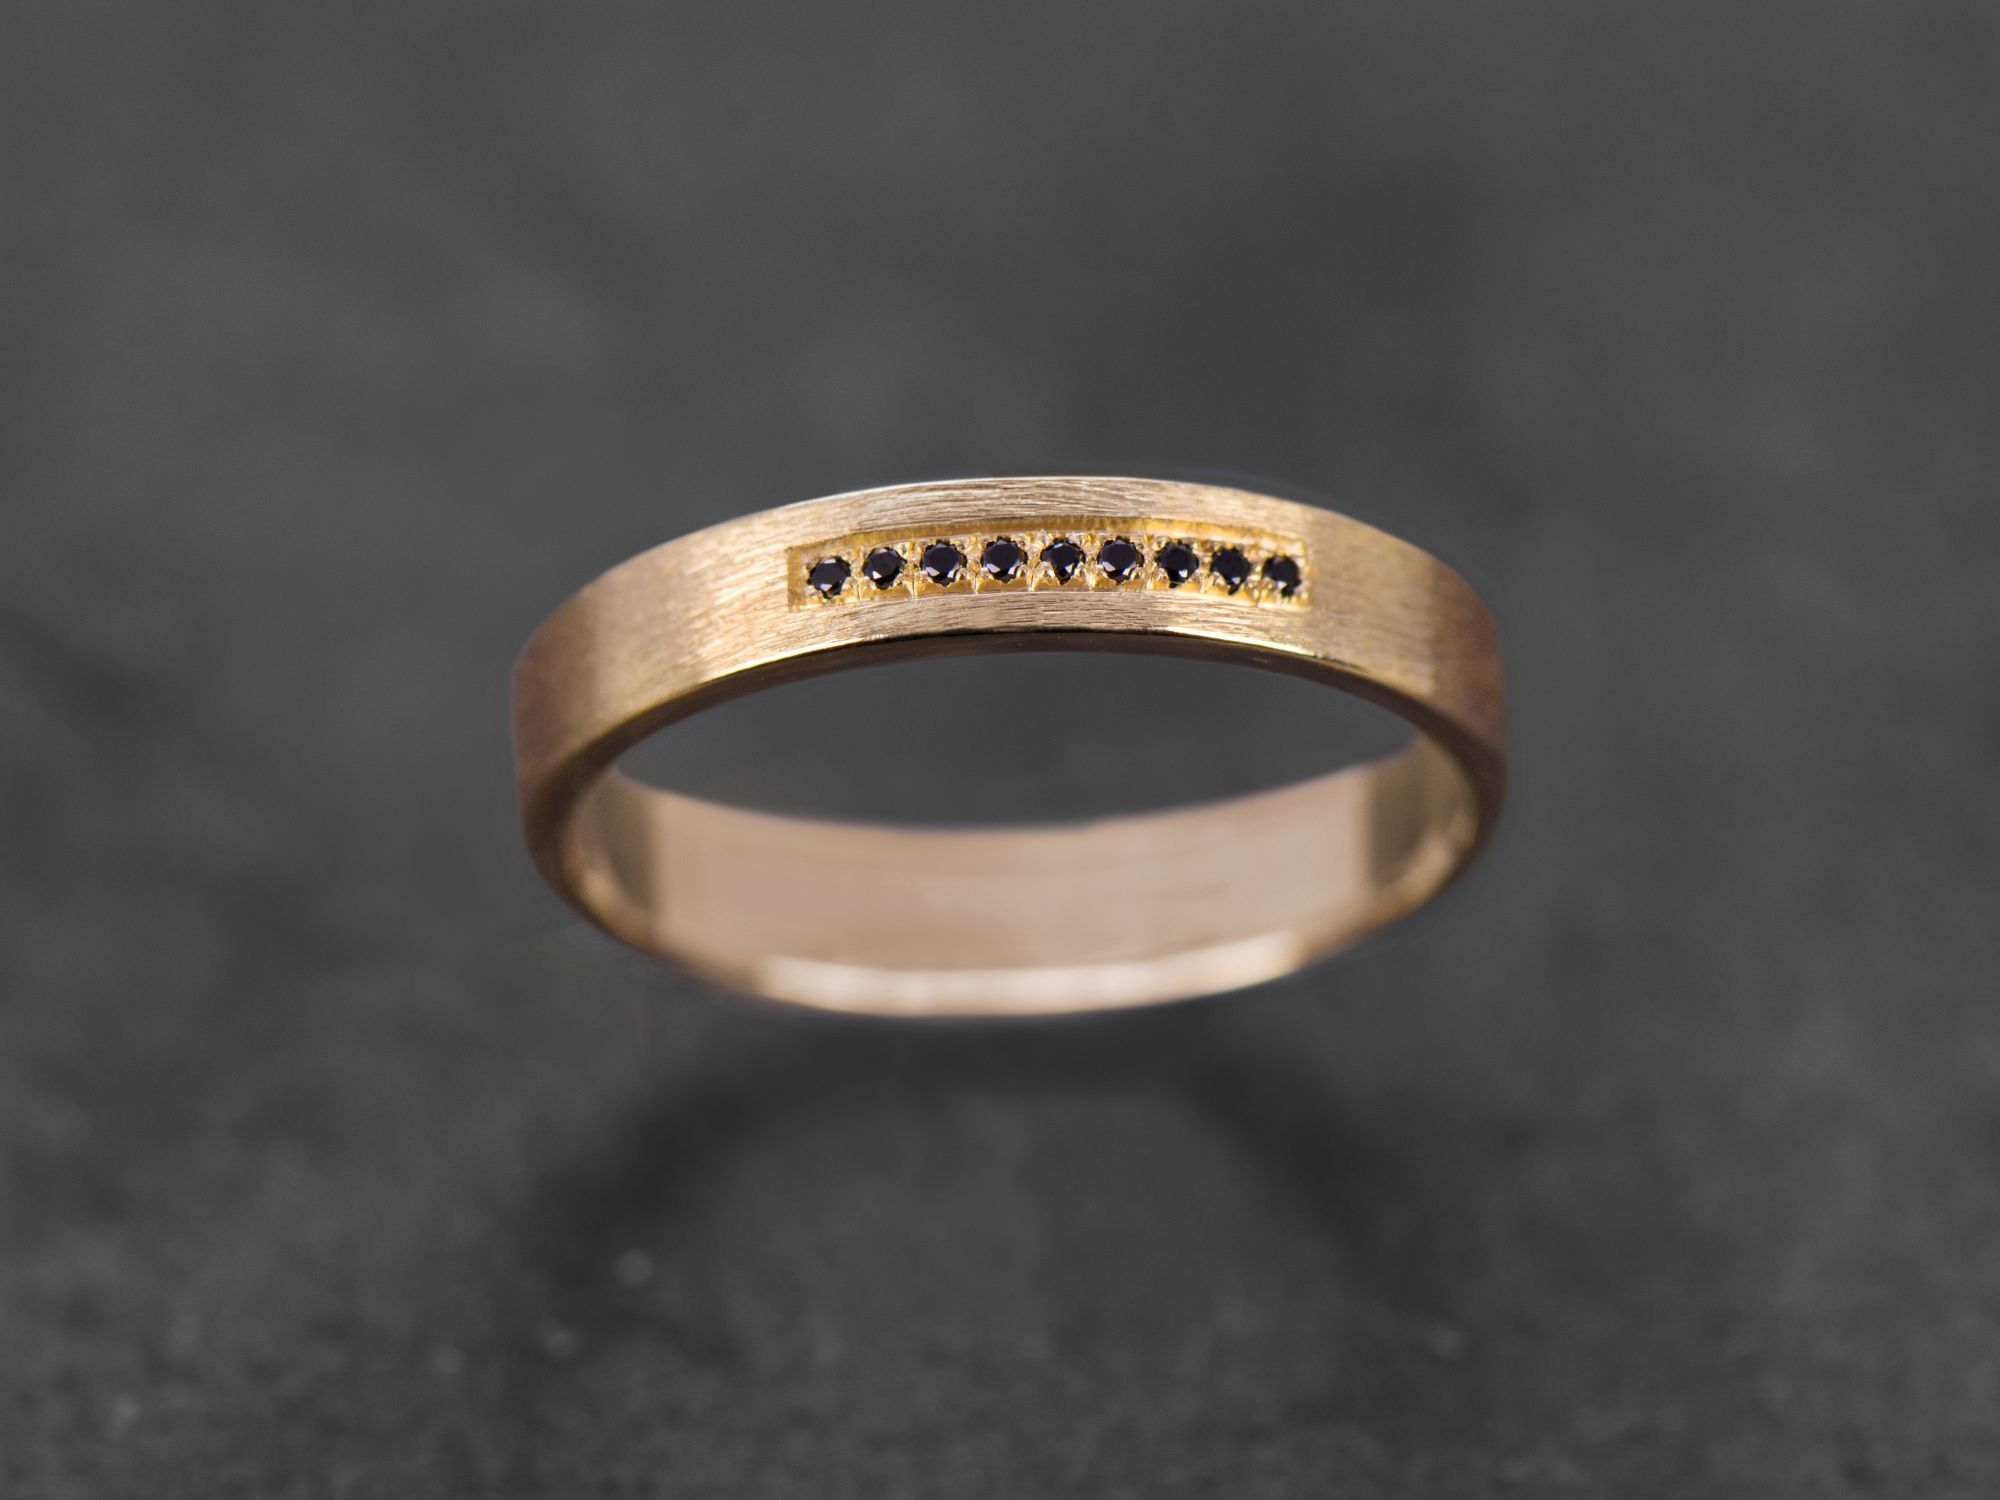 Bague Galatée or jaune diamants noirs